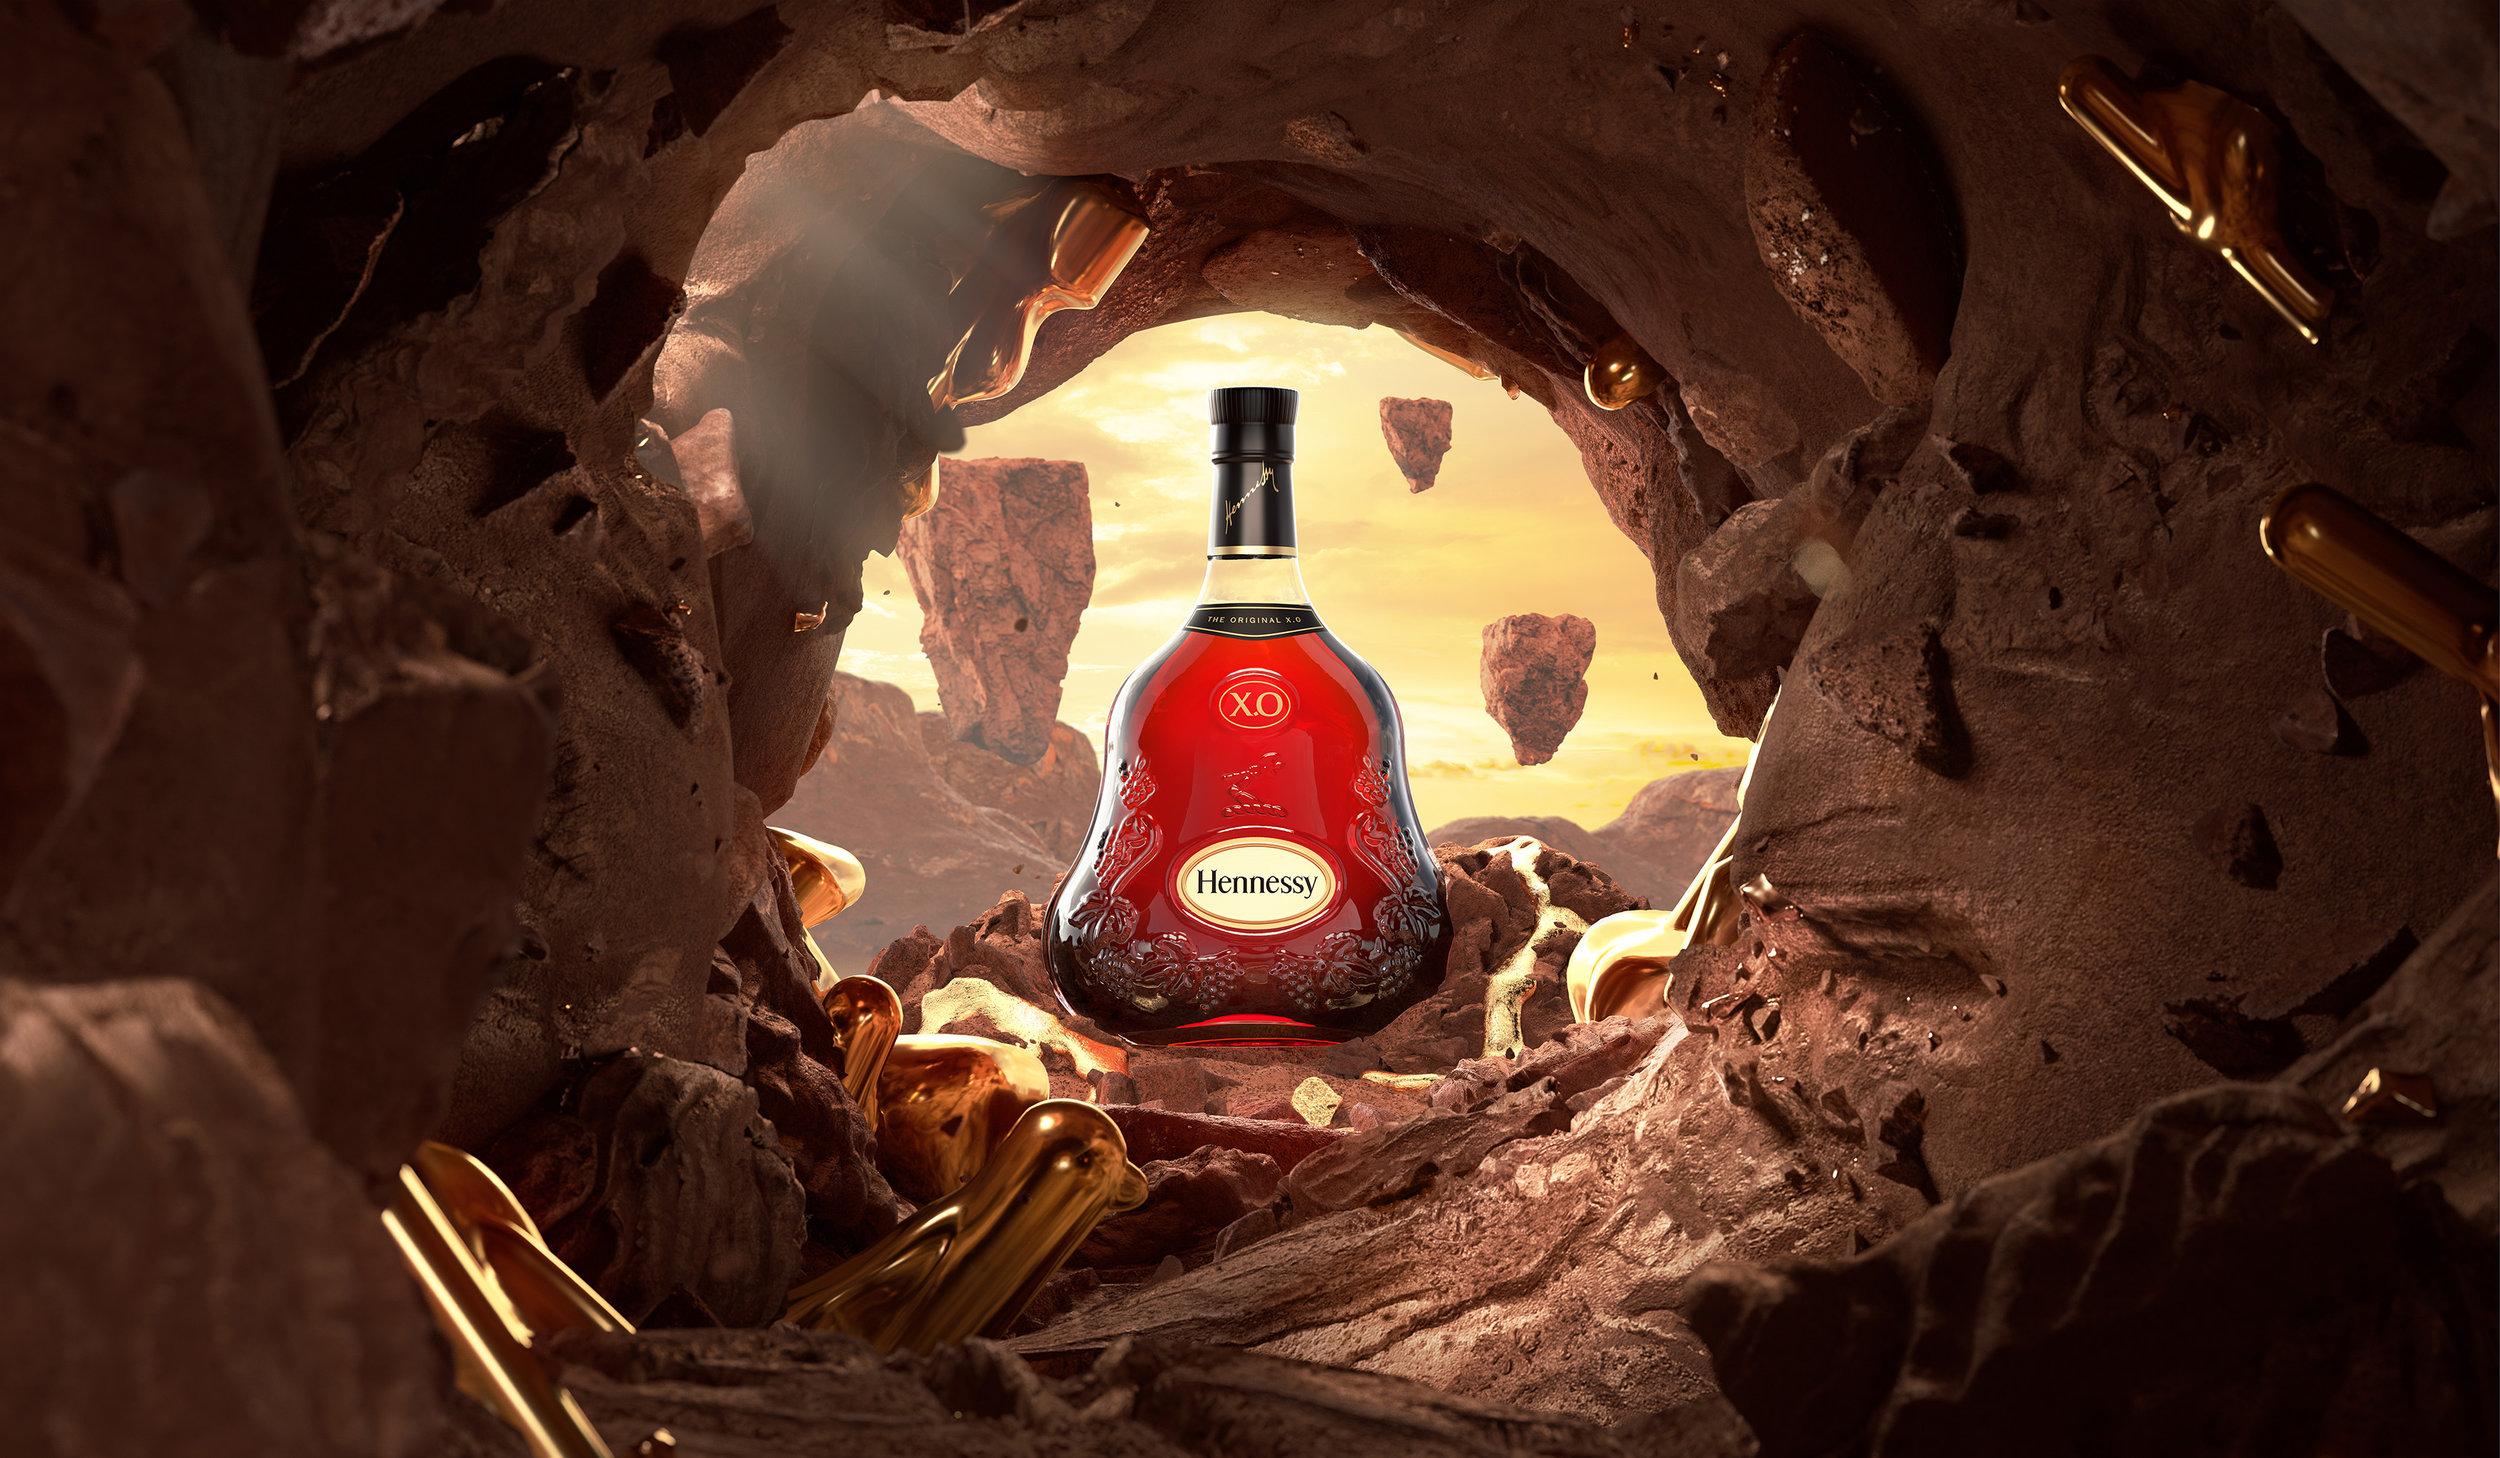 Hennessy_XO_Chapter5_ChocolateLull_DETAIL_28k.jpg